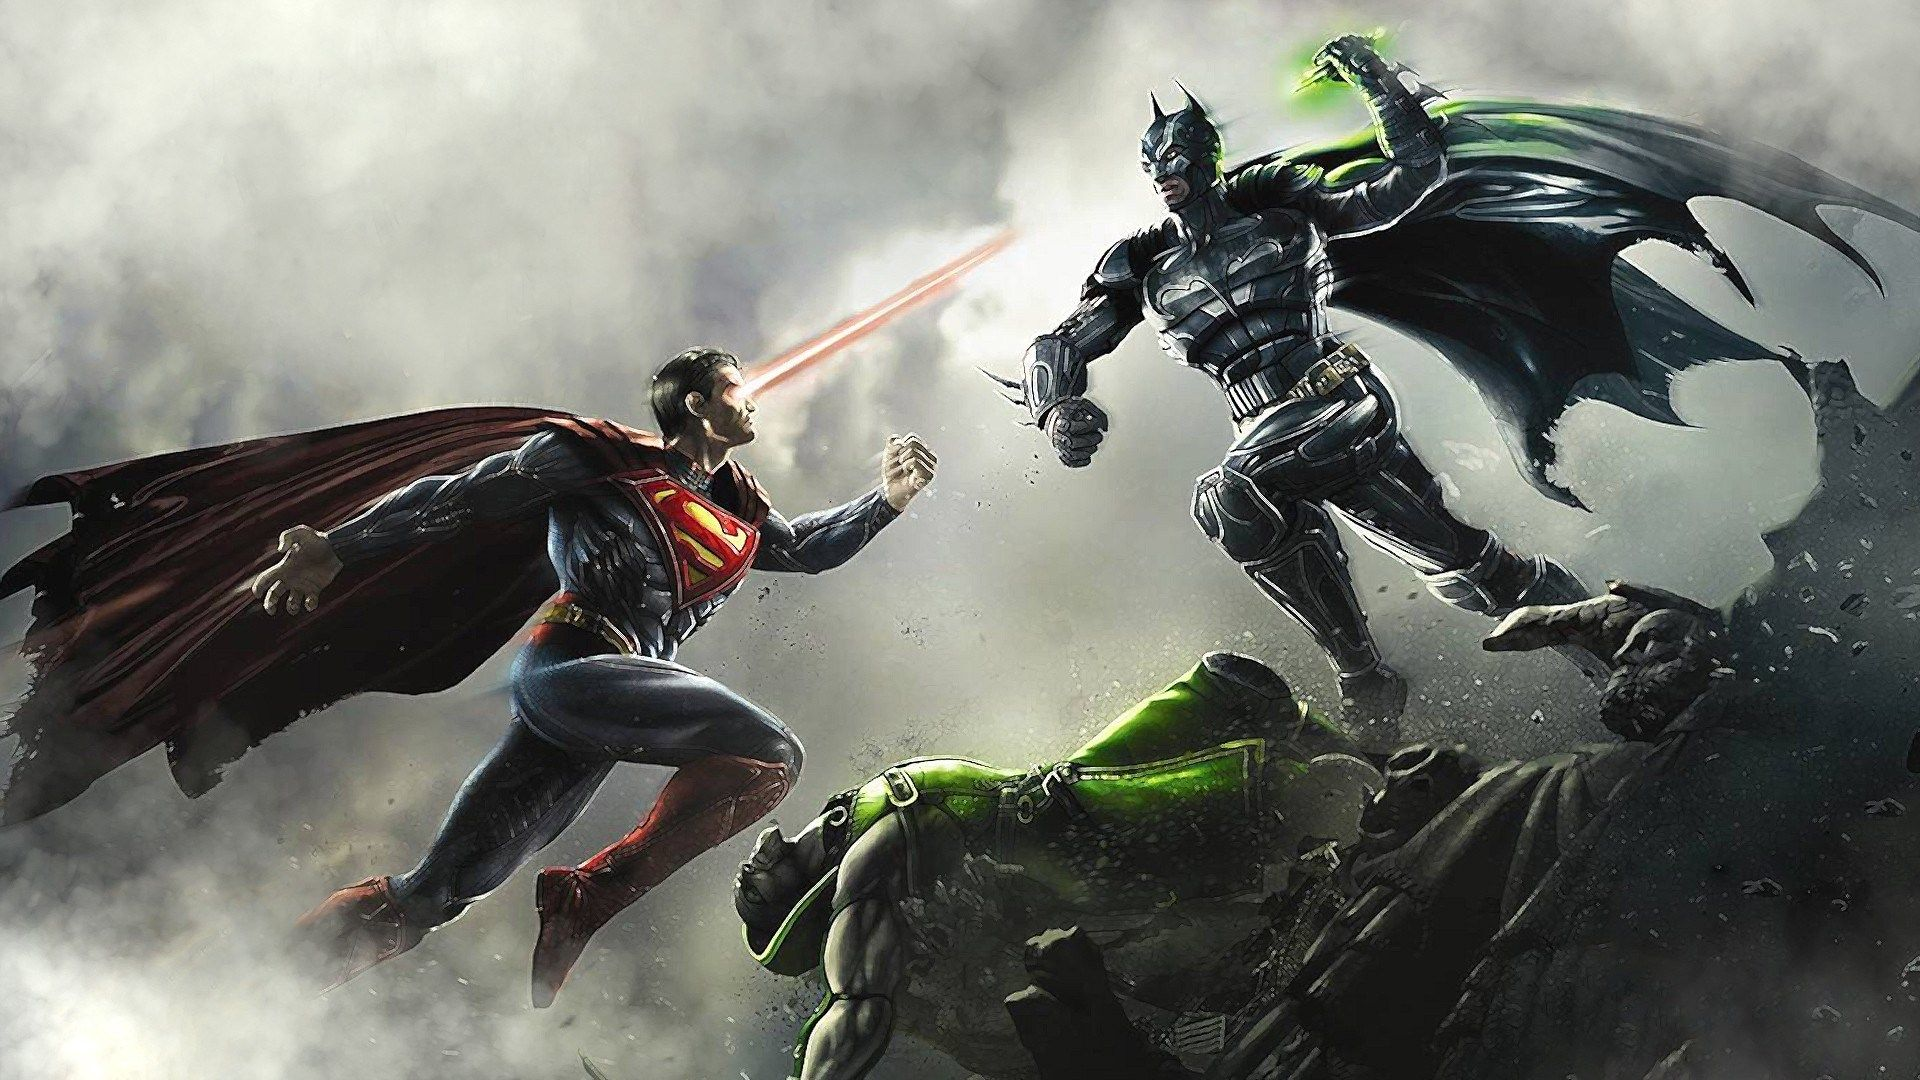 Injustice Gods Among Us Wallpaper Hd Injustice Gods Among Us Category Batman V Superman Dawn Of Justice Superman Wallpaper Batman Comic Wallpaper